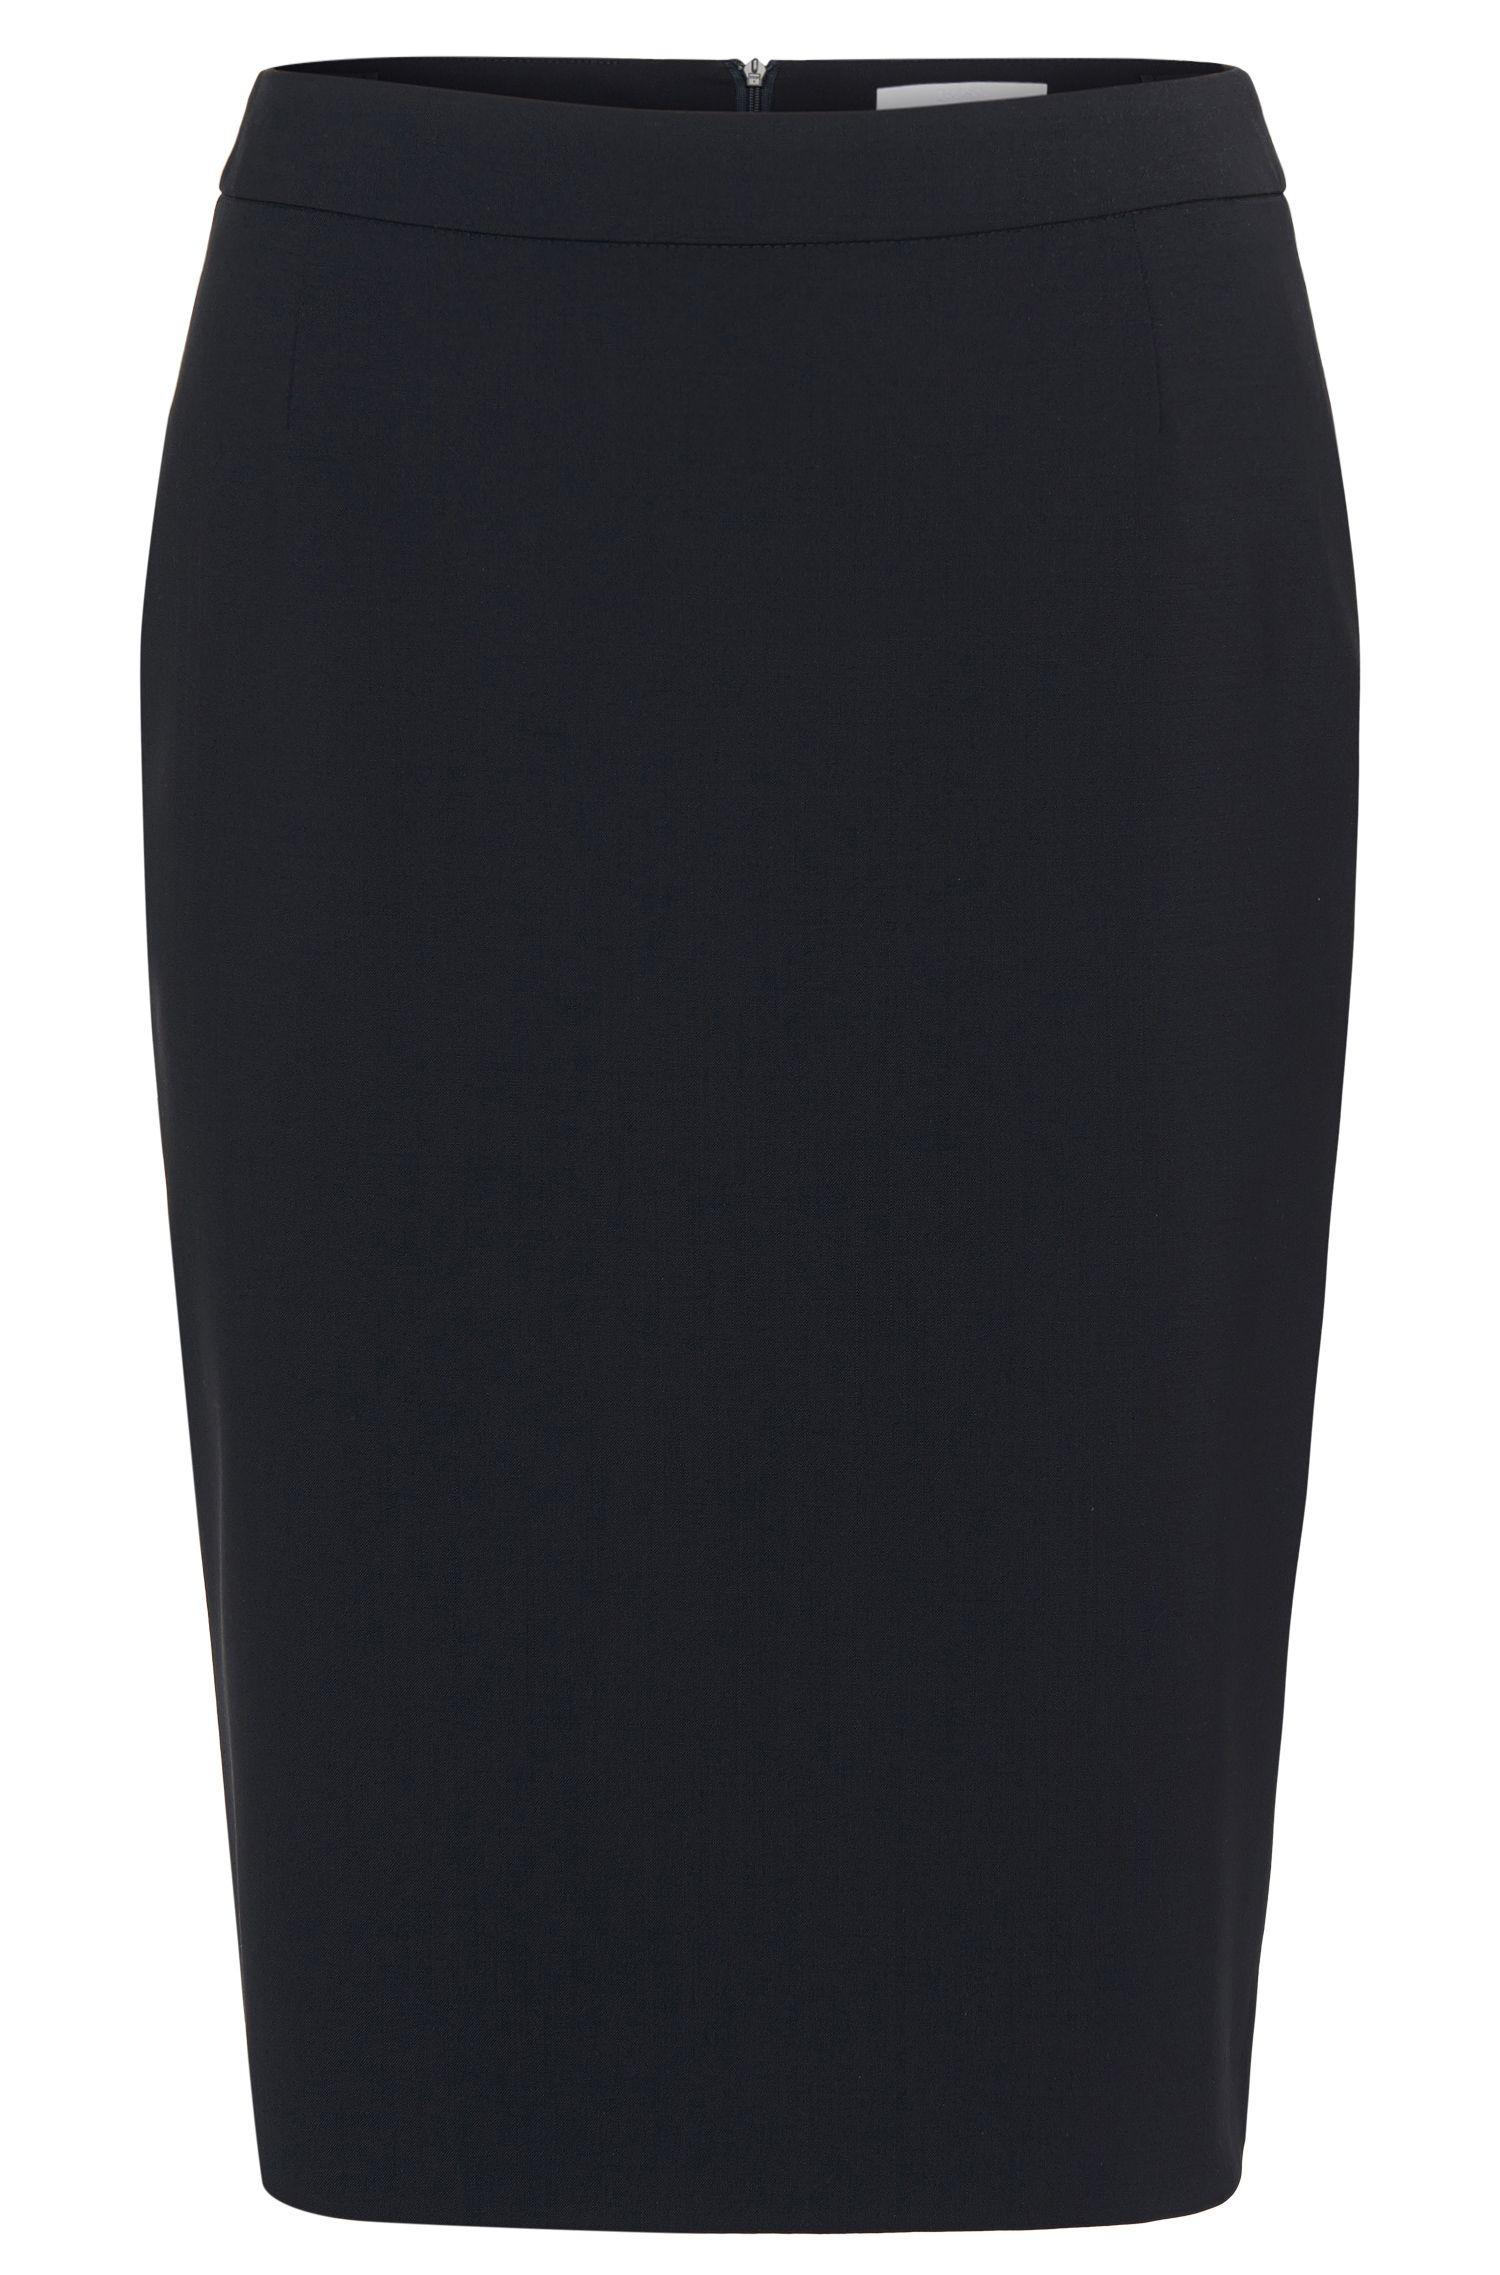 'Vilea' | Stretch Virgin Wool Pencil Skirt